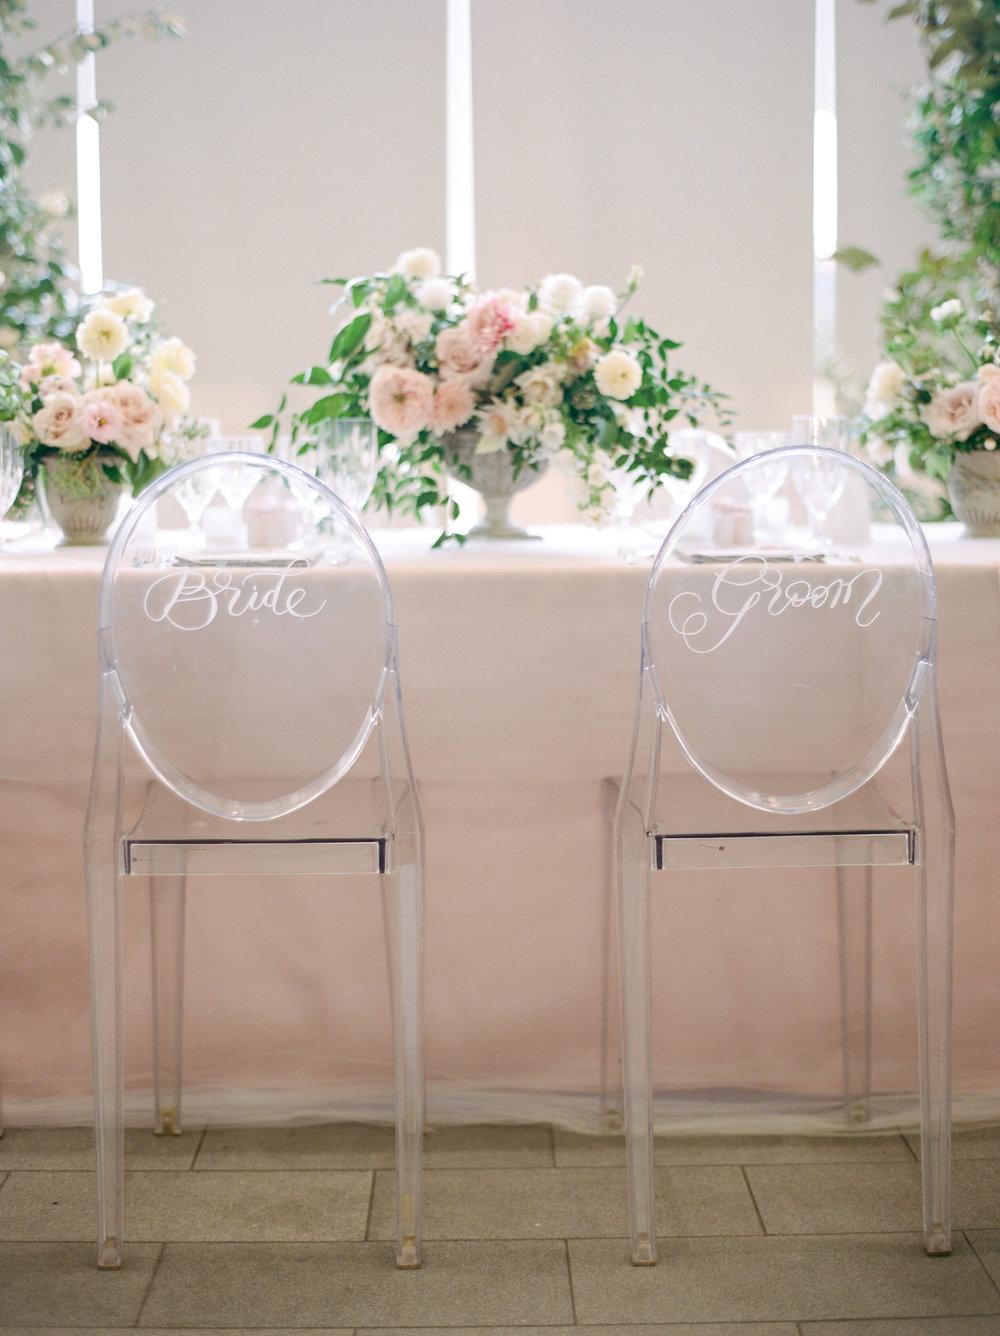 Martha-Stewart-Wedding-Dana-Fernandez-Photography-Josh-Texas-Film-Houston-Wedding-Fine-Art-Photographer-McGovern-Centennial-Gardens-Top-Best-45.jpg